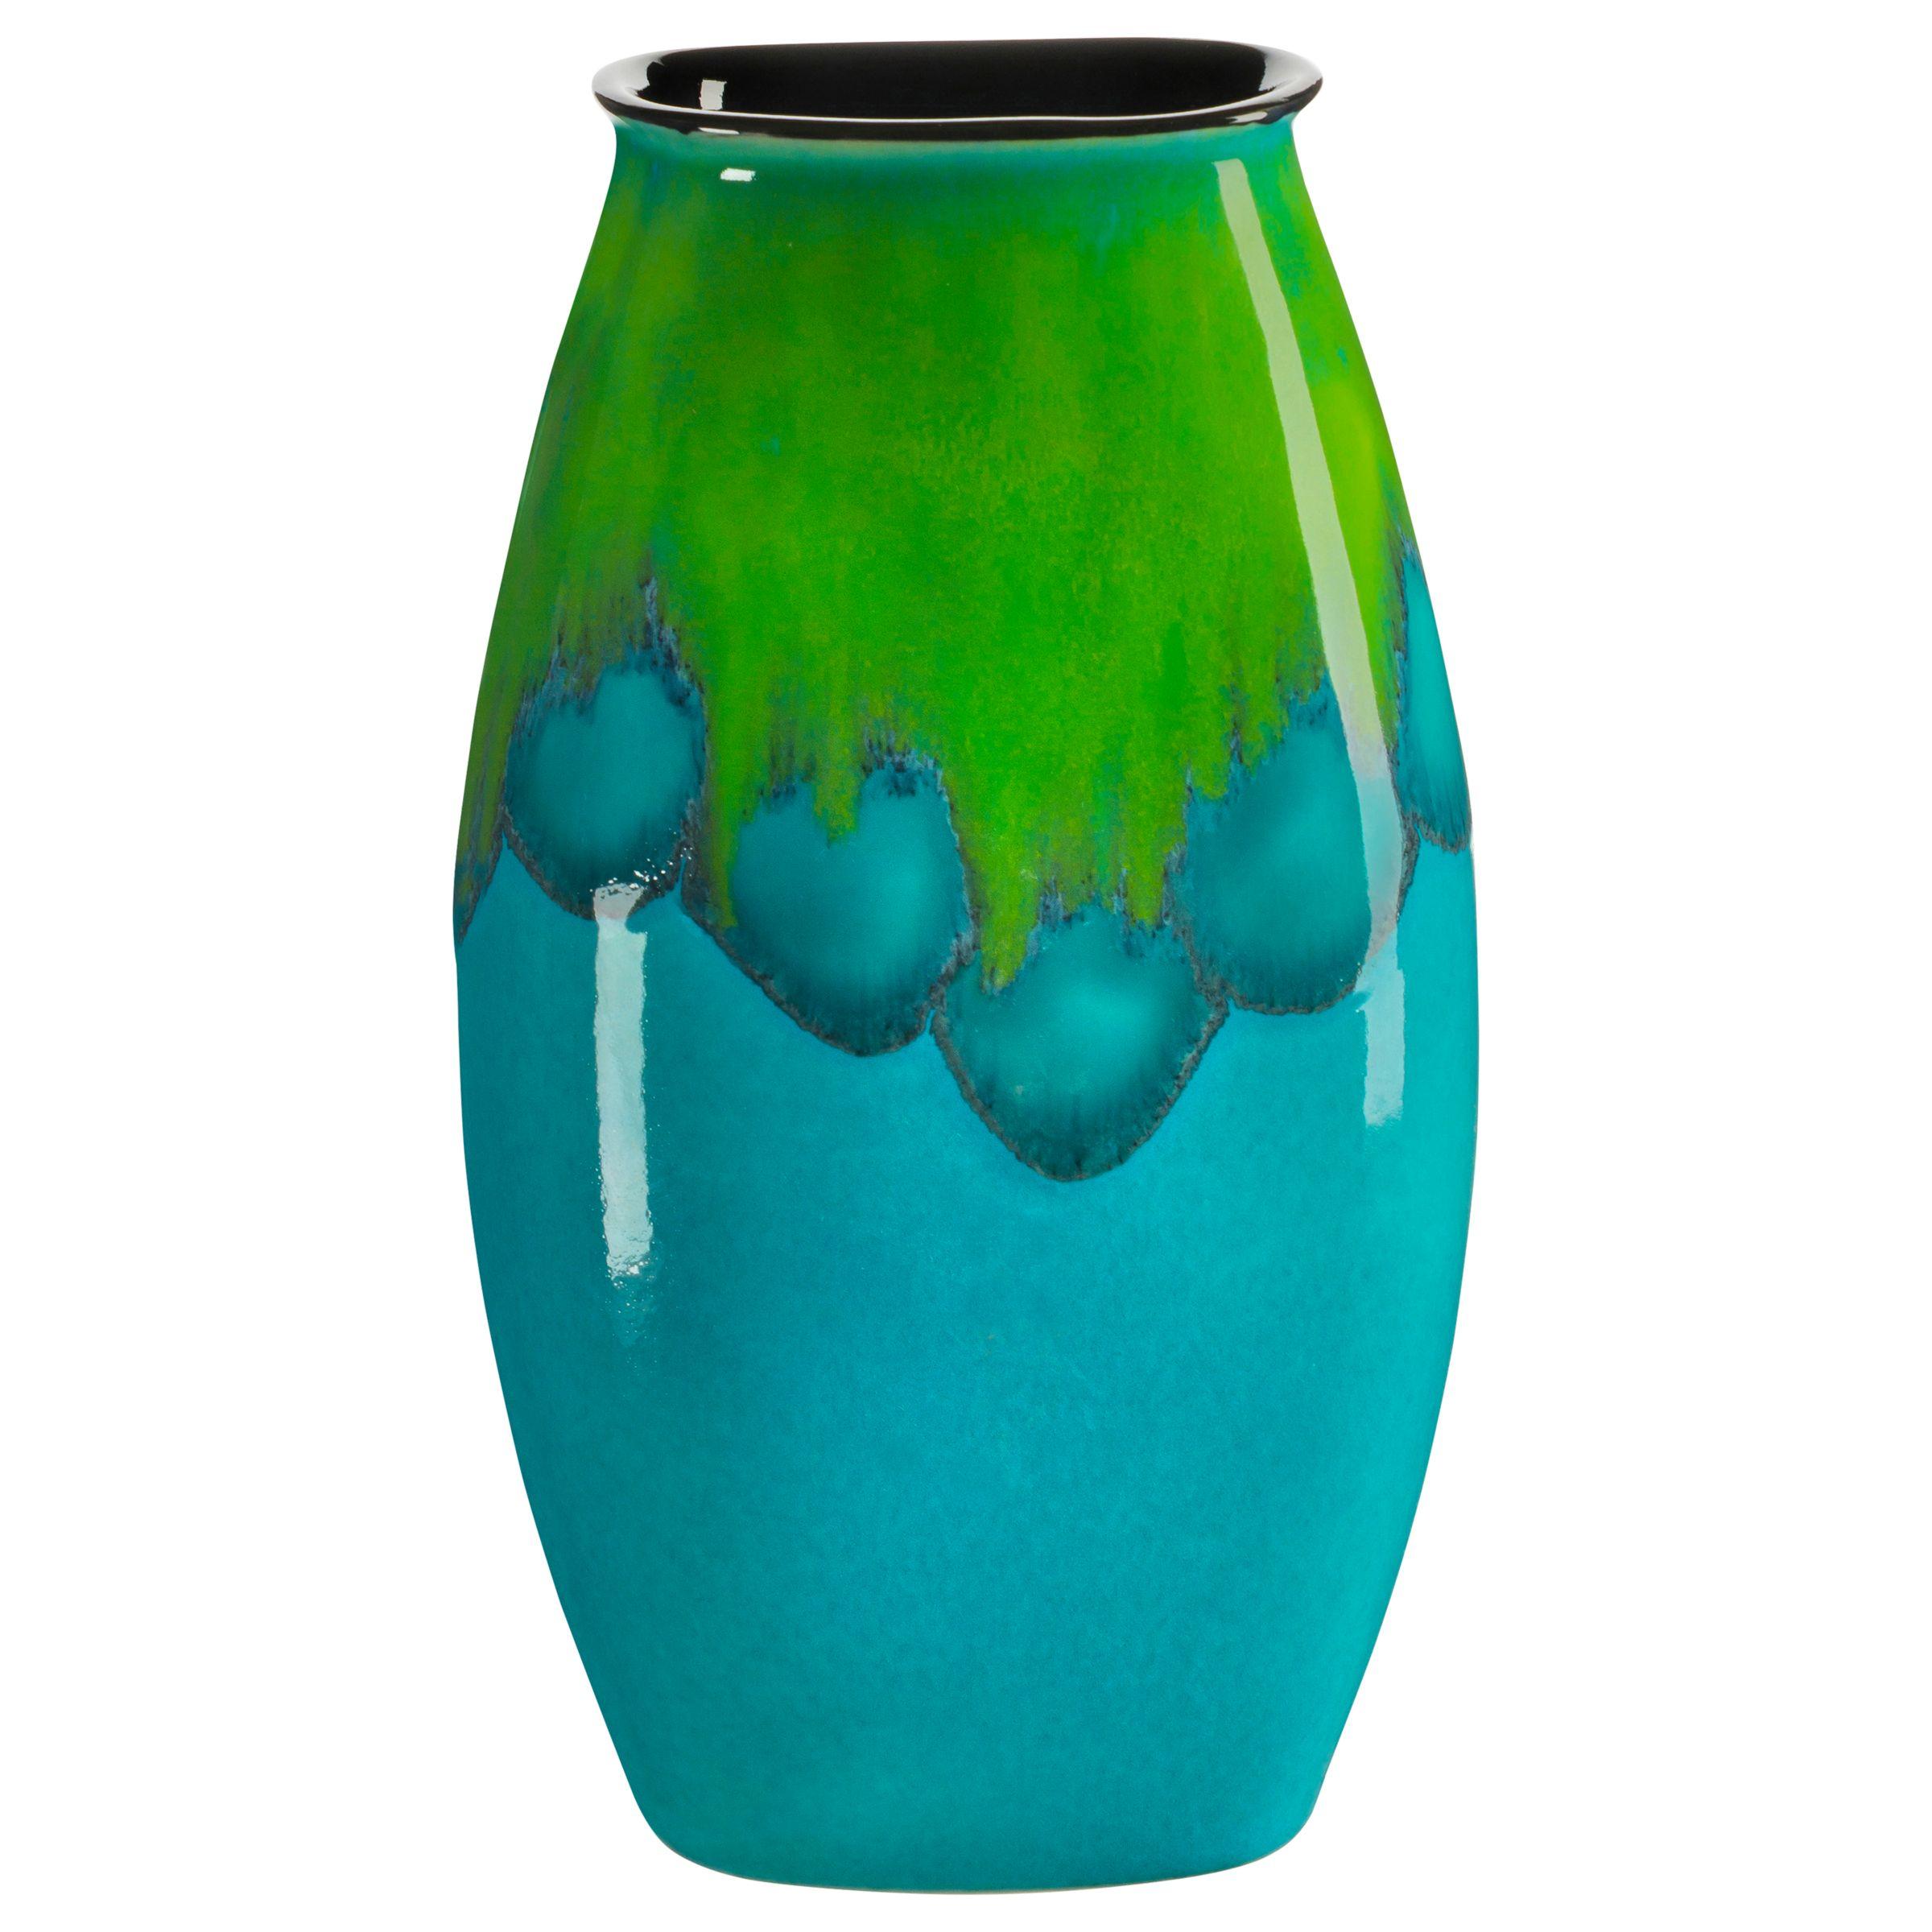 Poole Pottery Poole Pottery Tallulah Manhattan Vase, H26cm